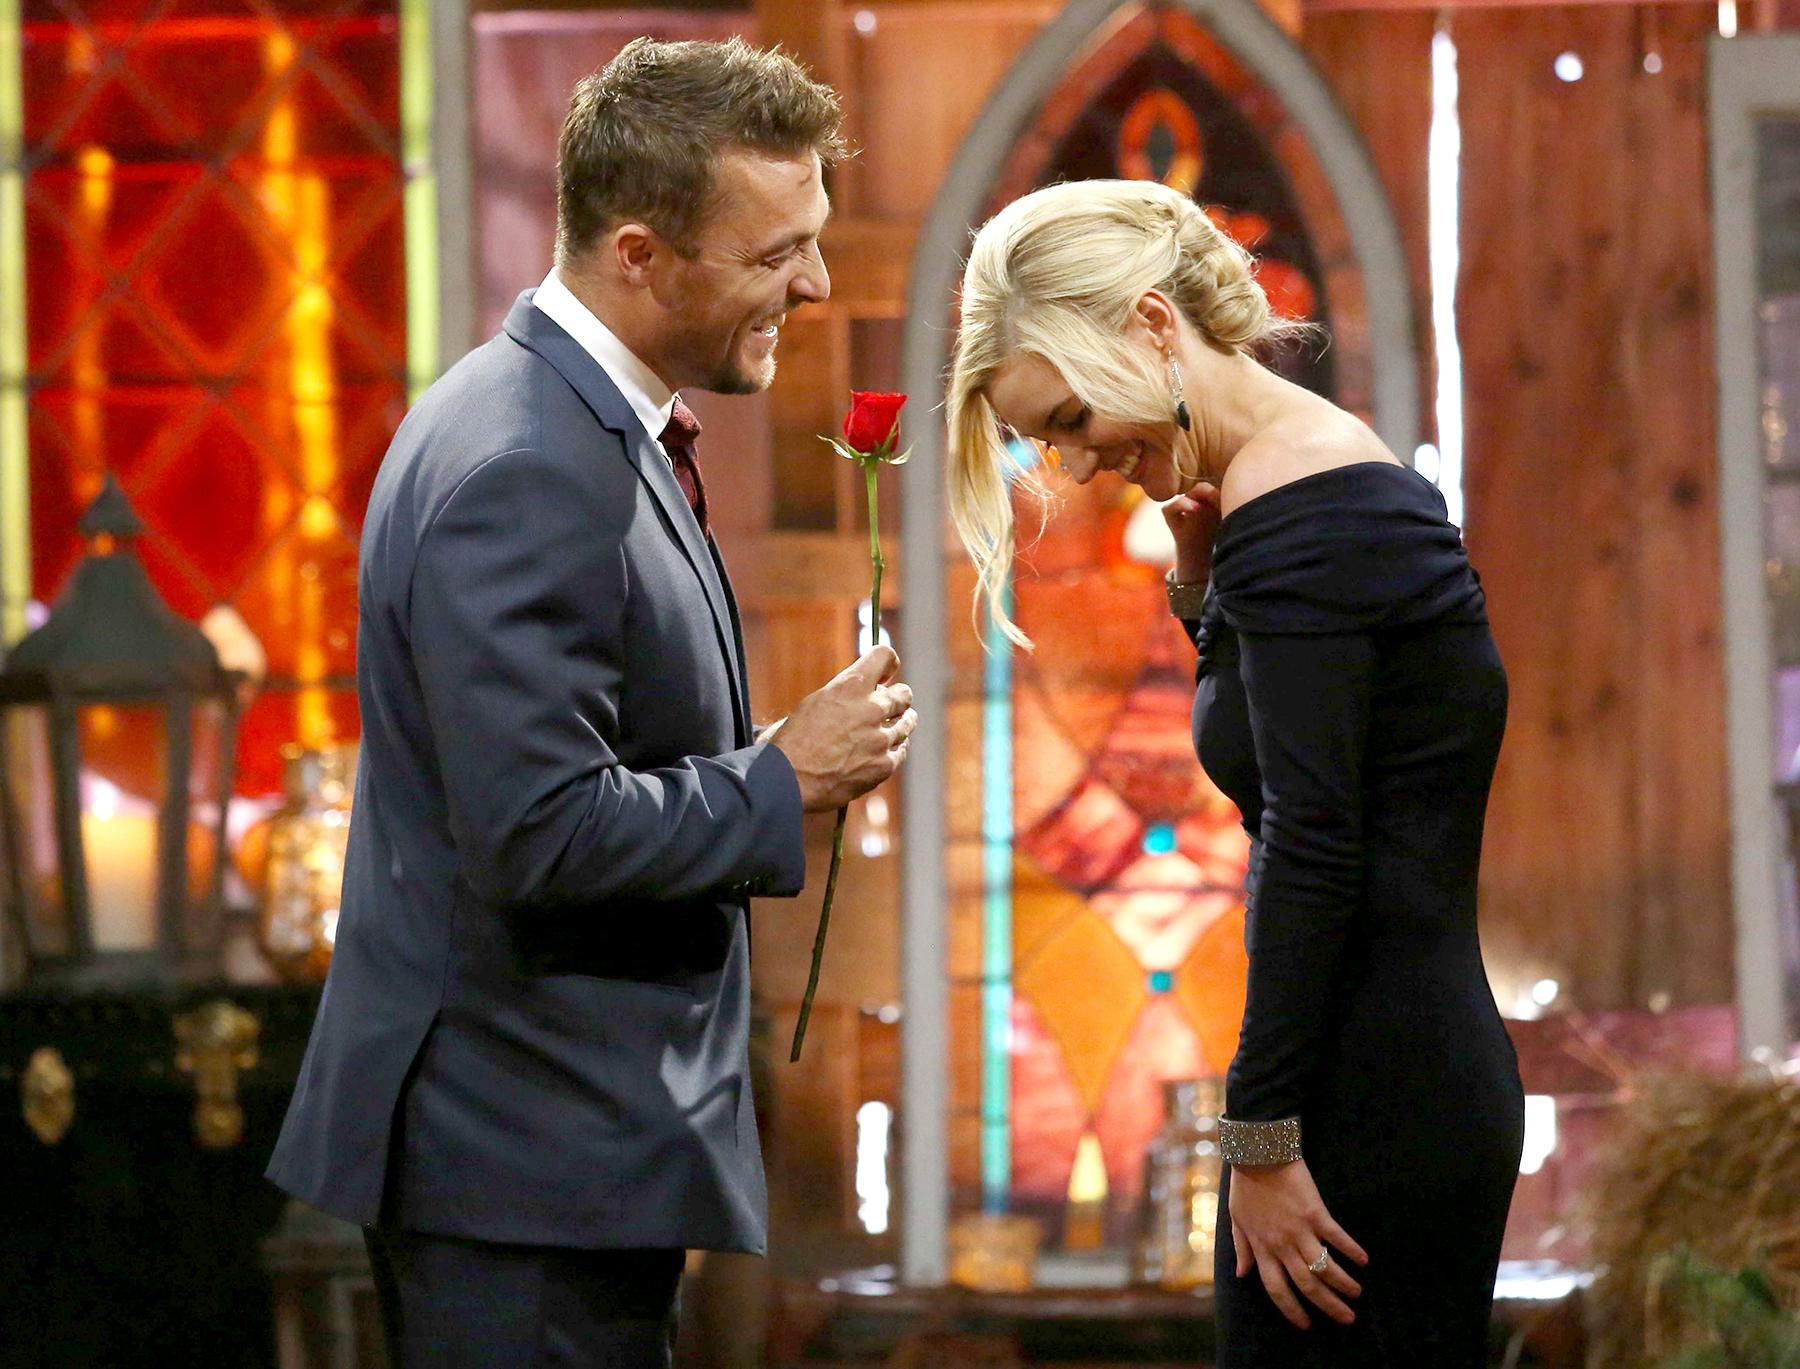 Chris and Whitney on The Bachelor.